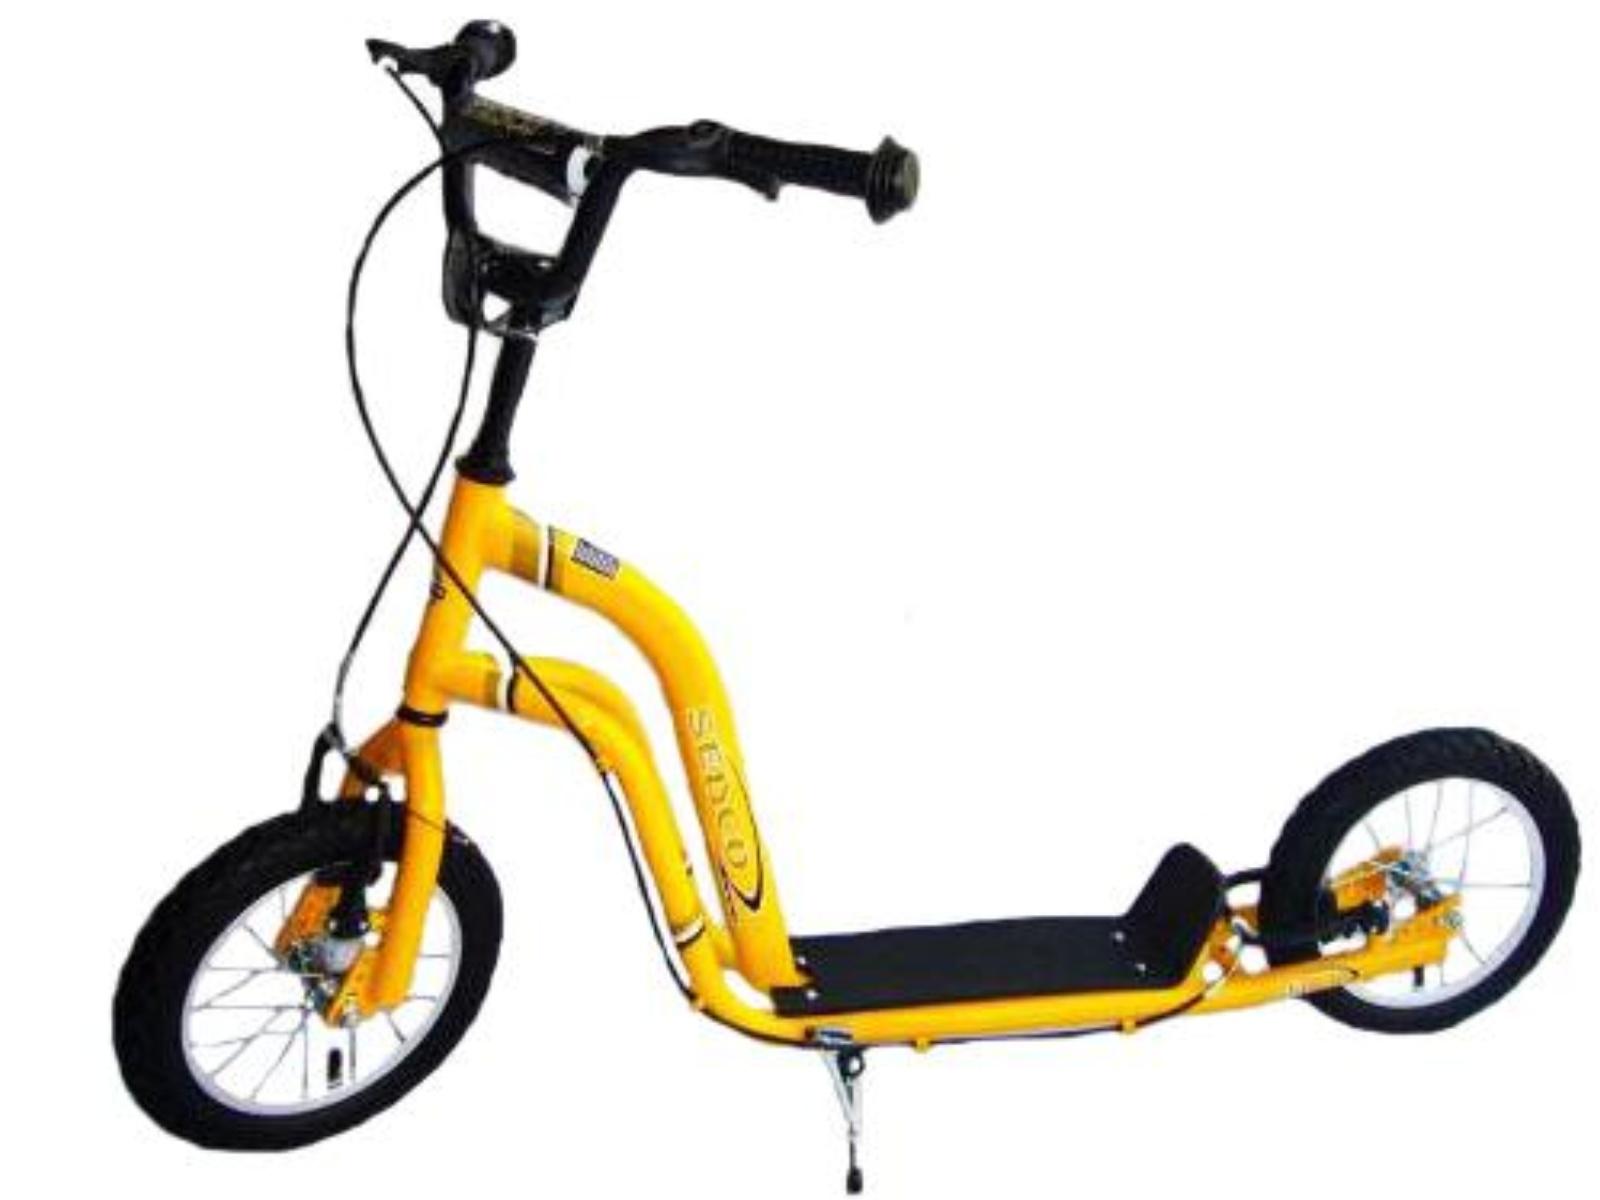 Koloběžka SEDCO City Line Sport Excelence 12 - žlutá